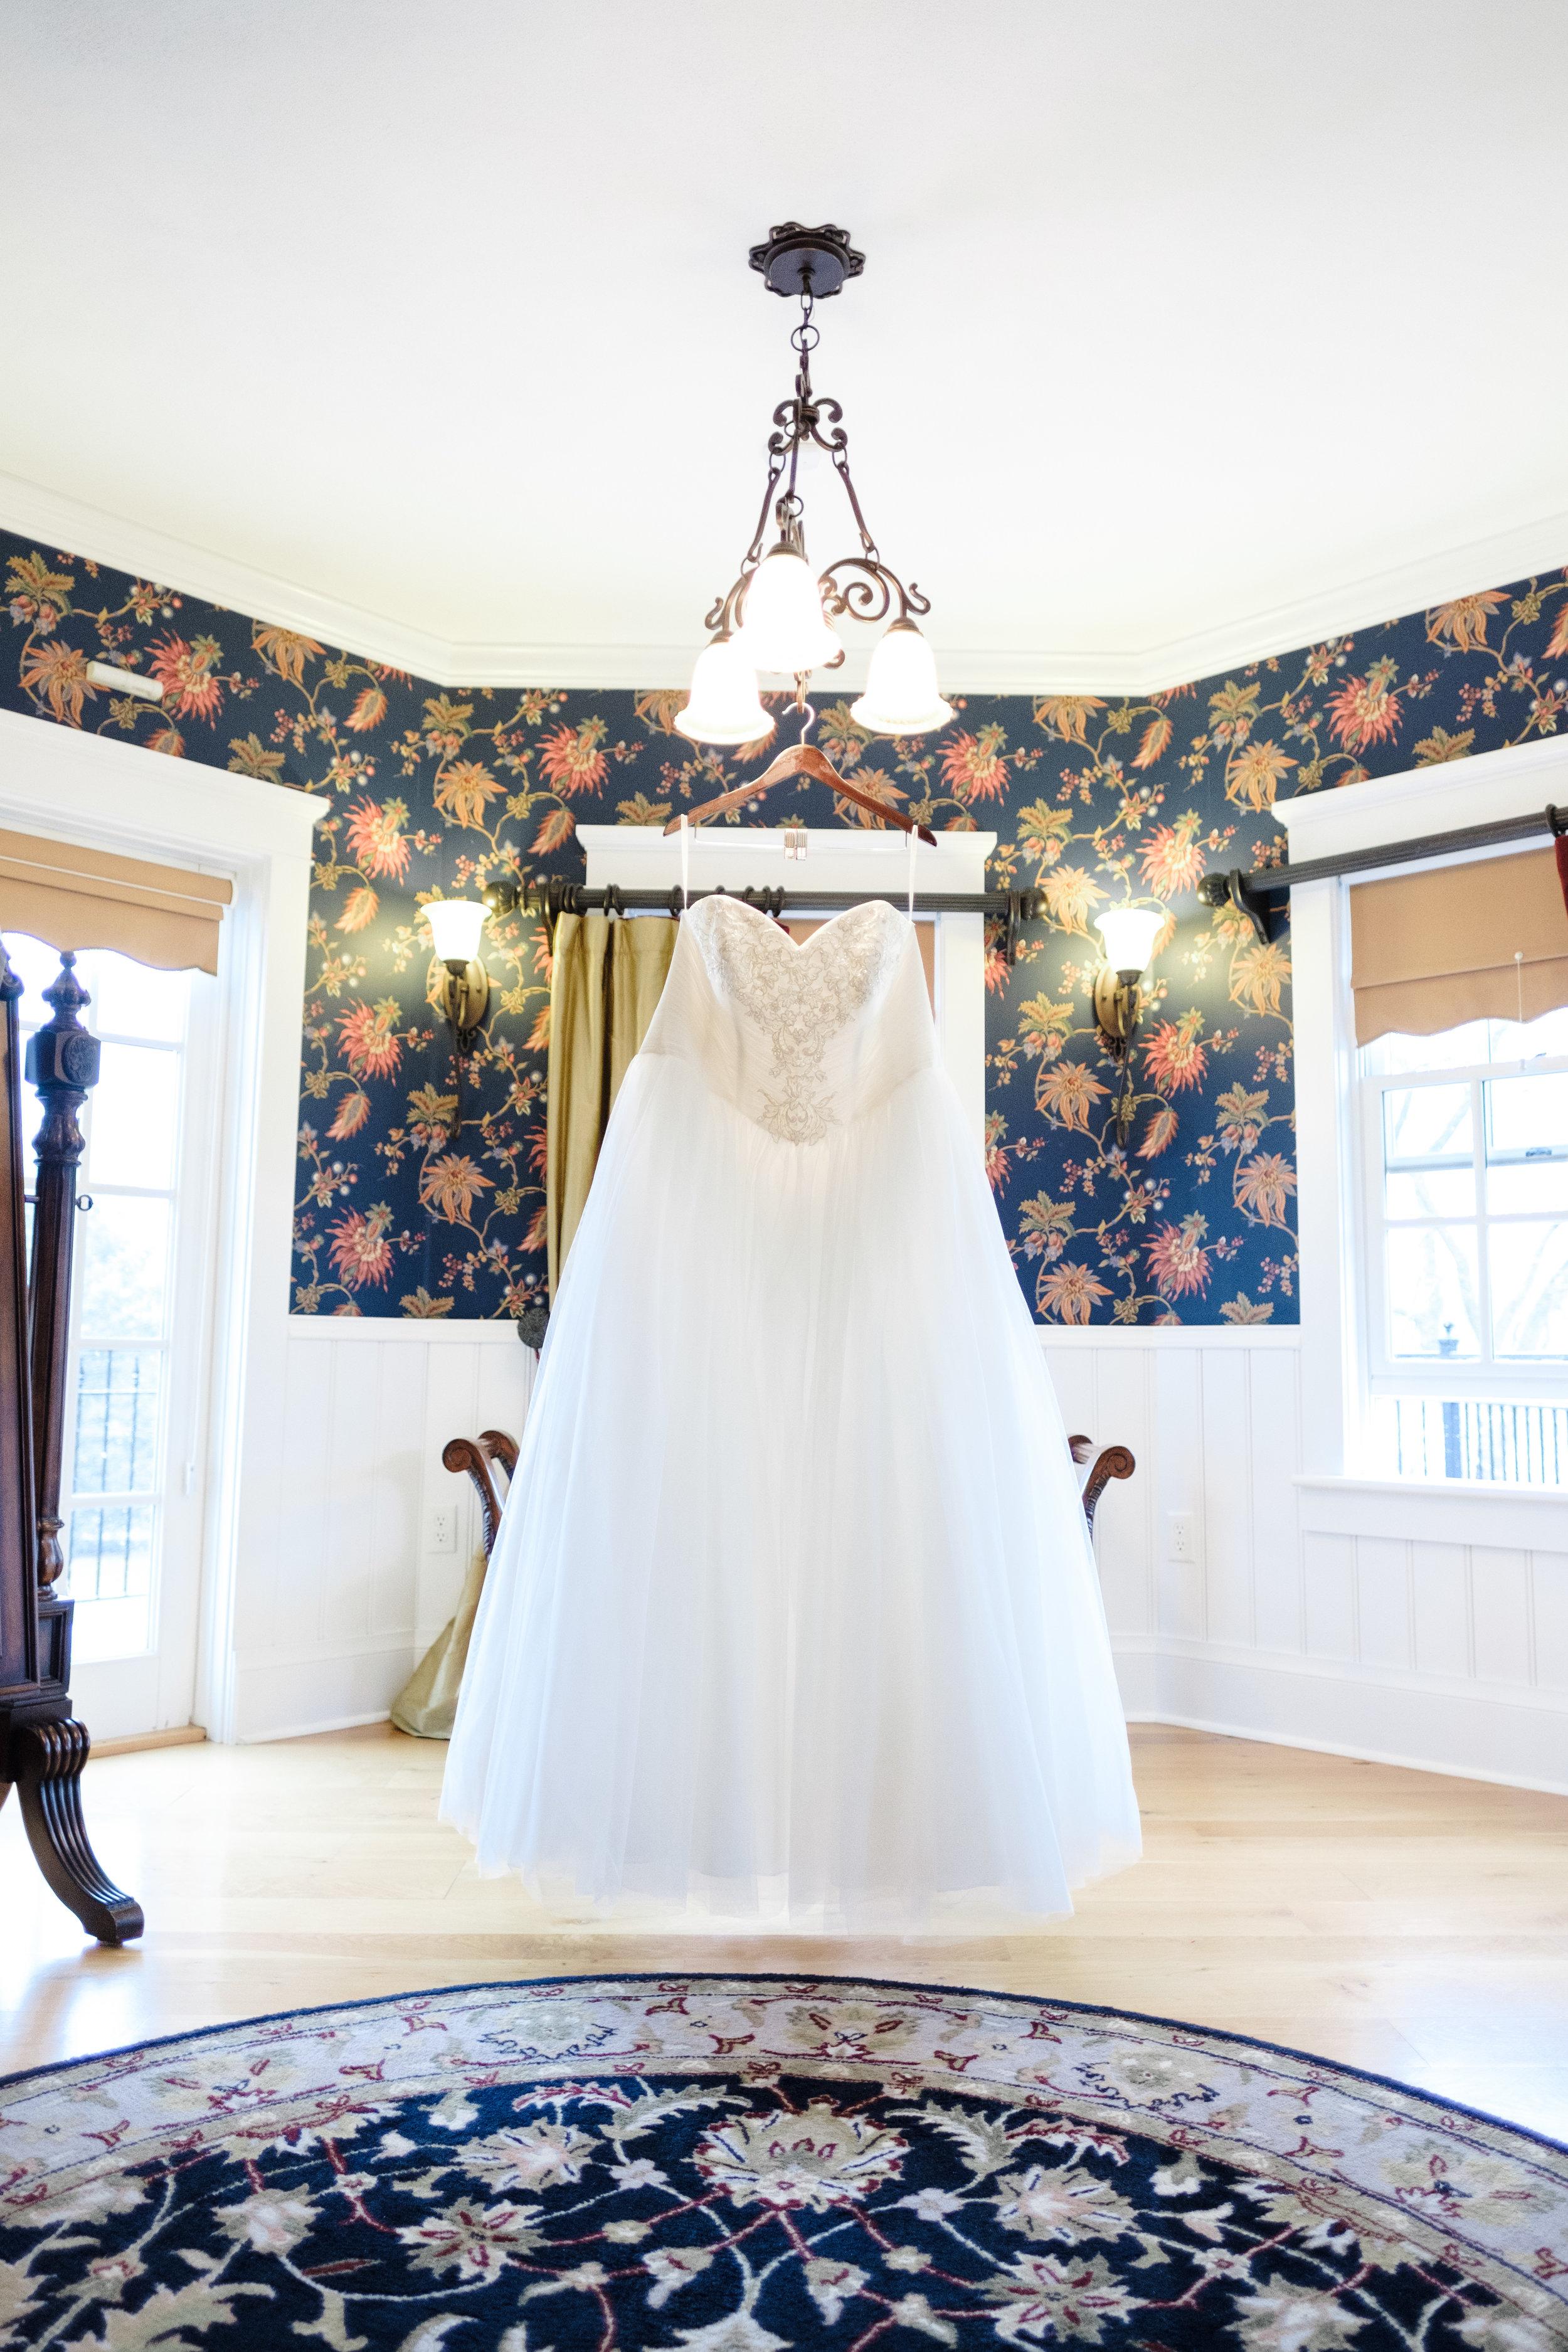 18-12-28 Corinne-Henry-Pavilion-Wedding-1.jpg